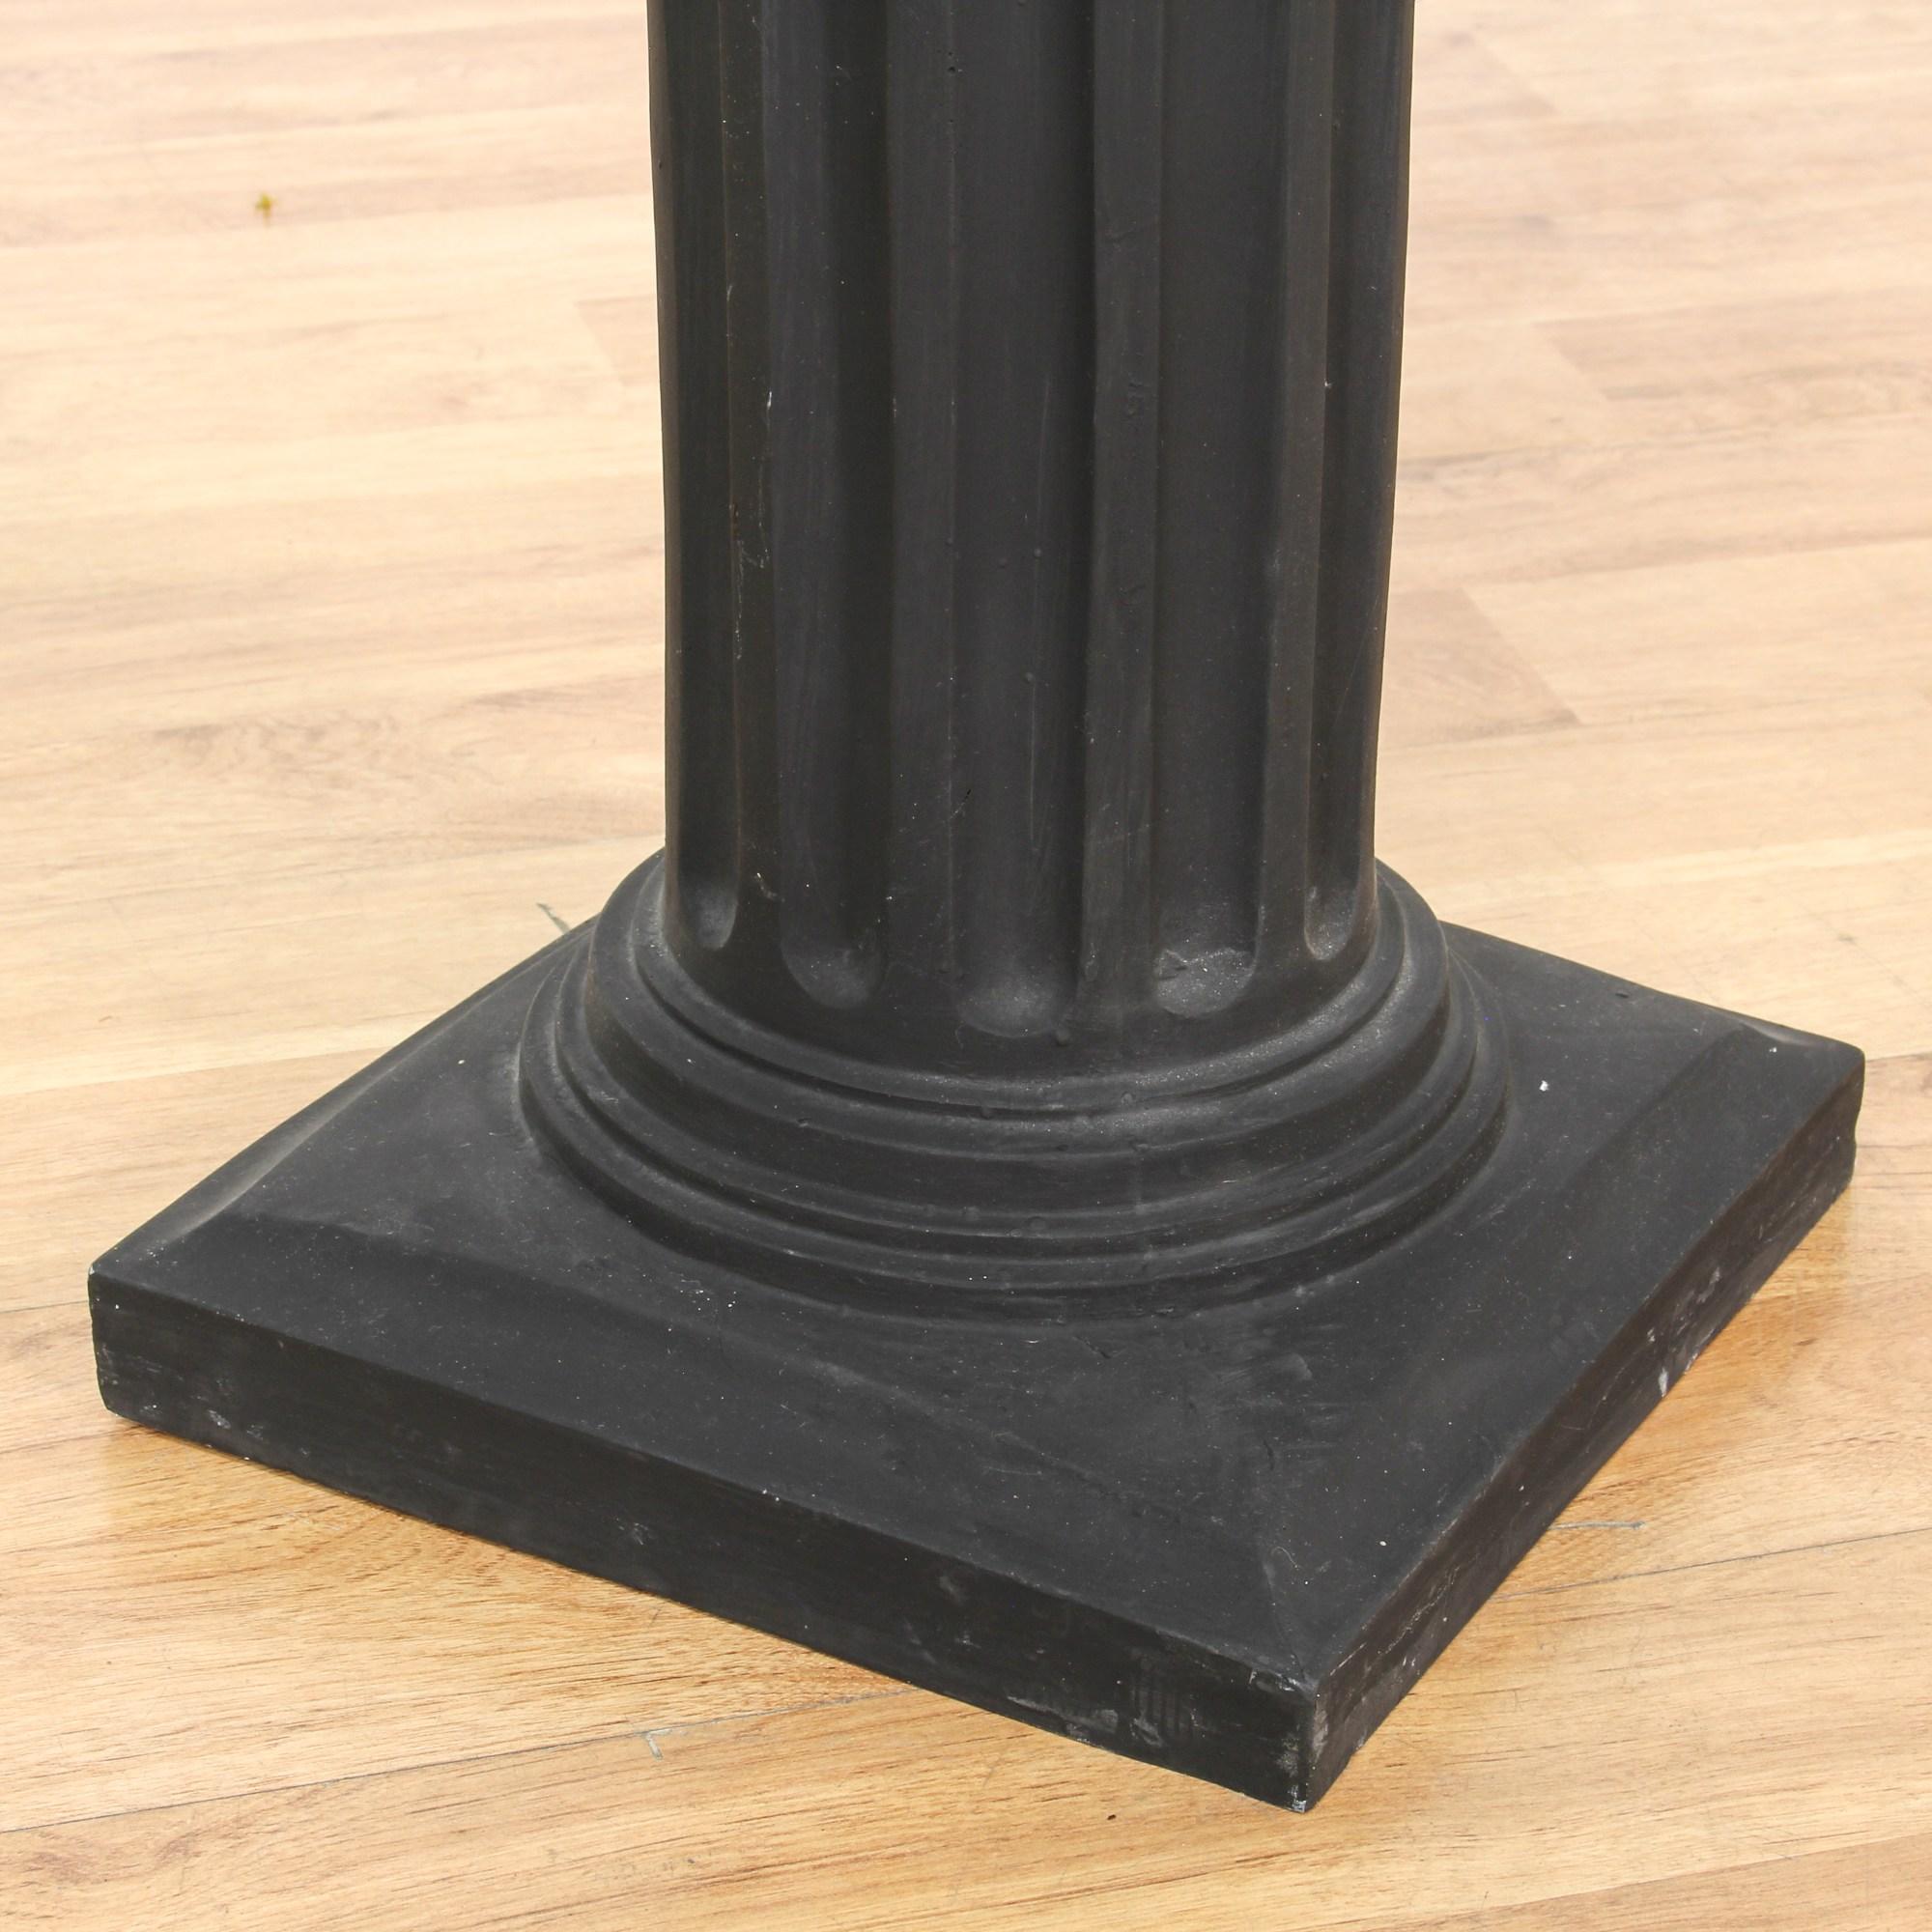 Black Ionic Column Pedestal Plant Stand Loveseat Vintage